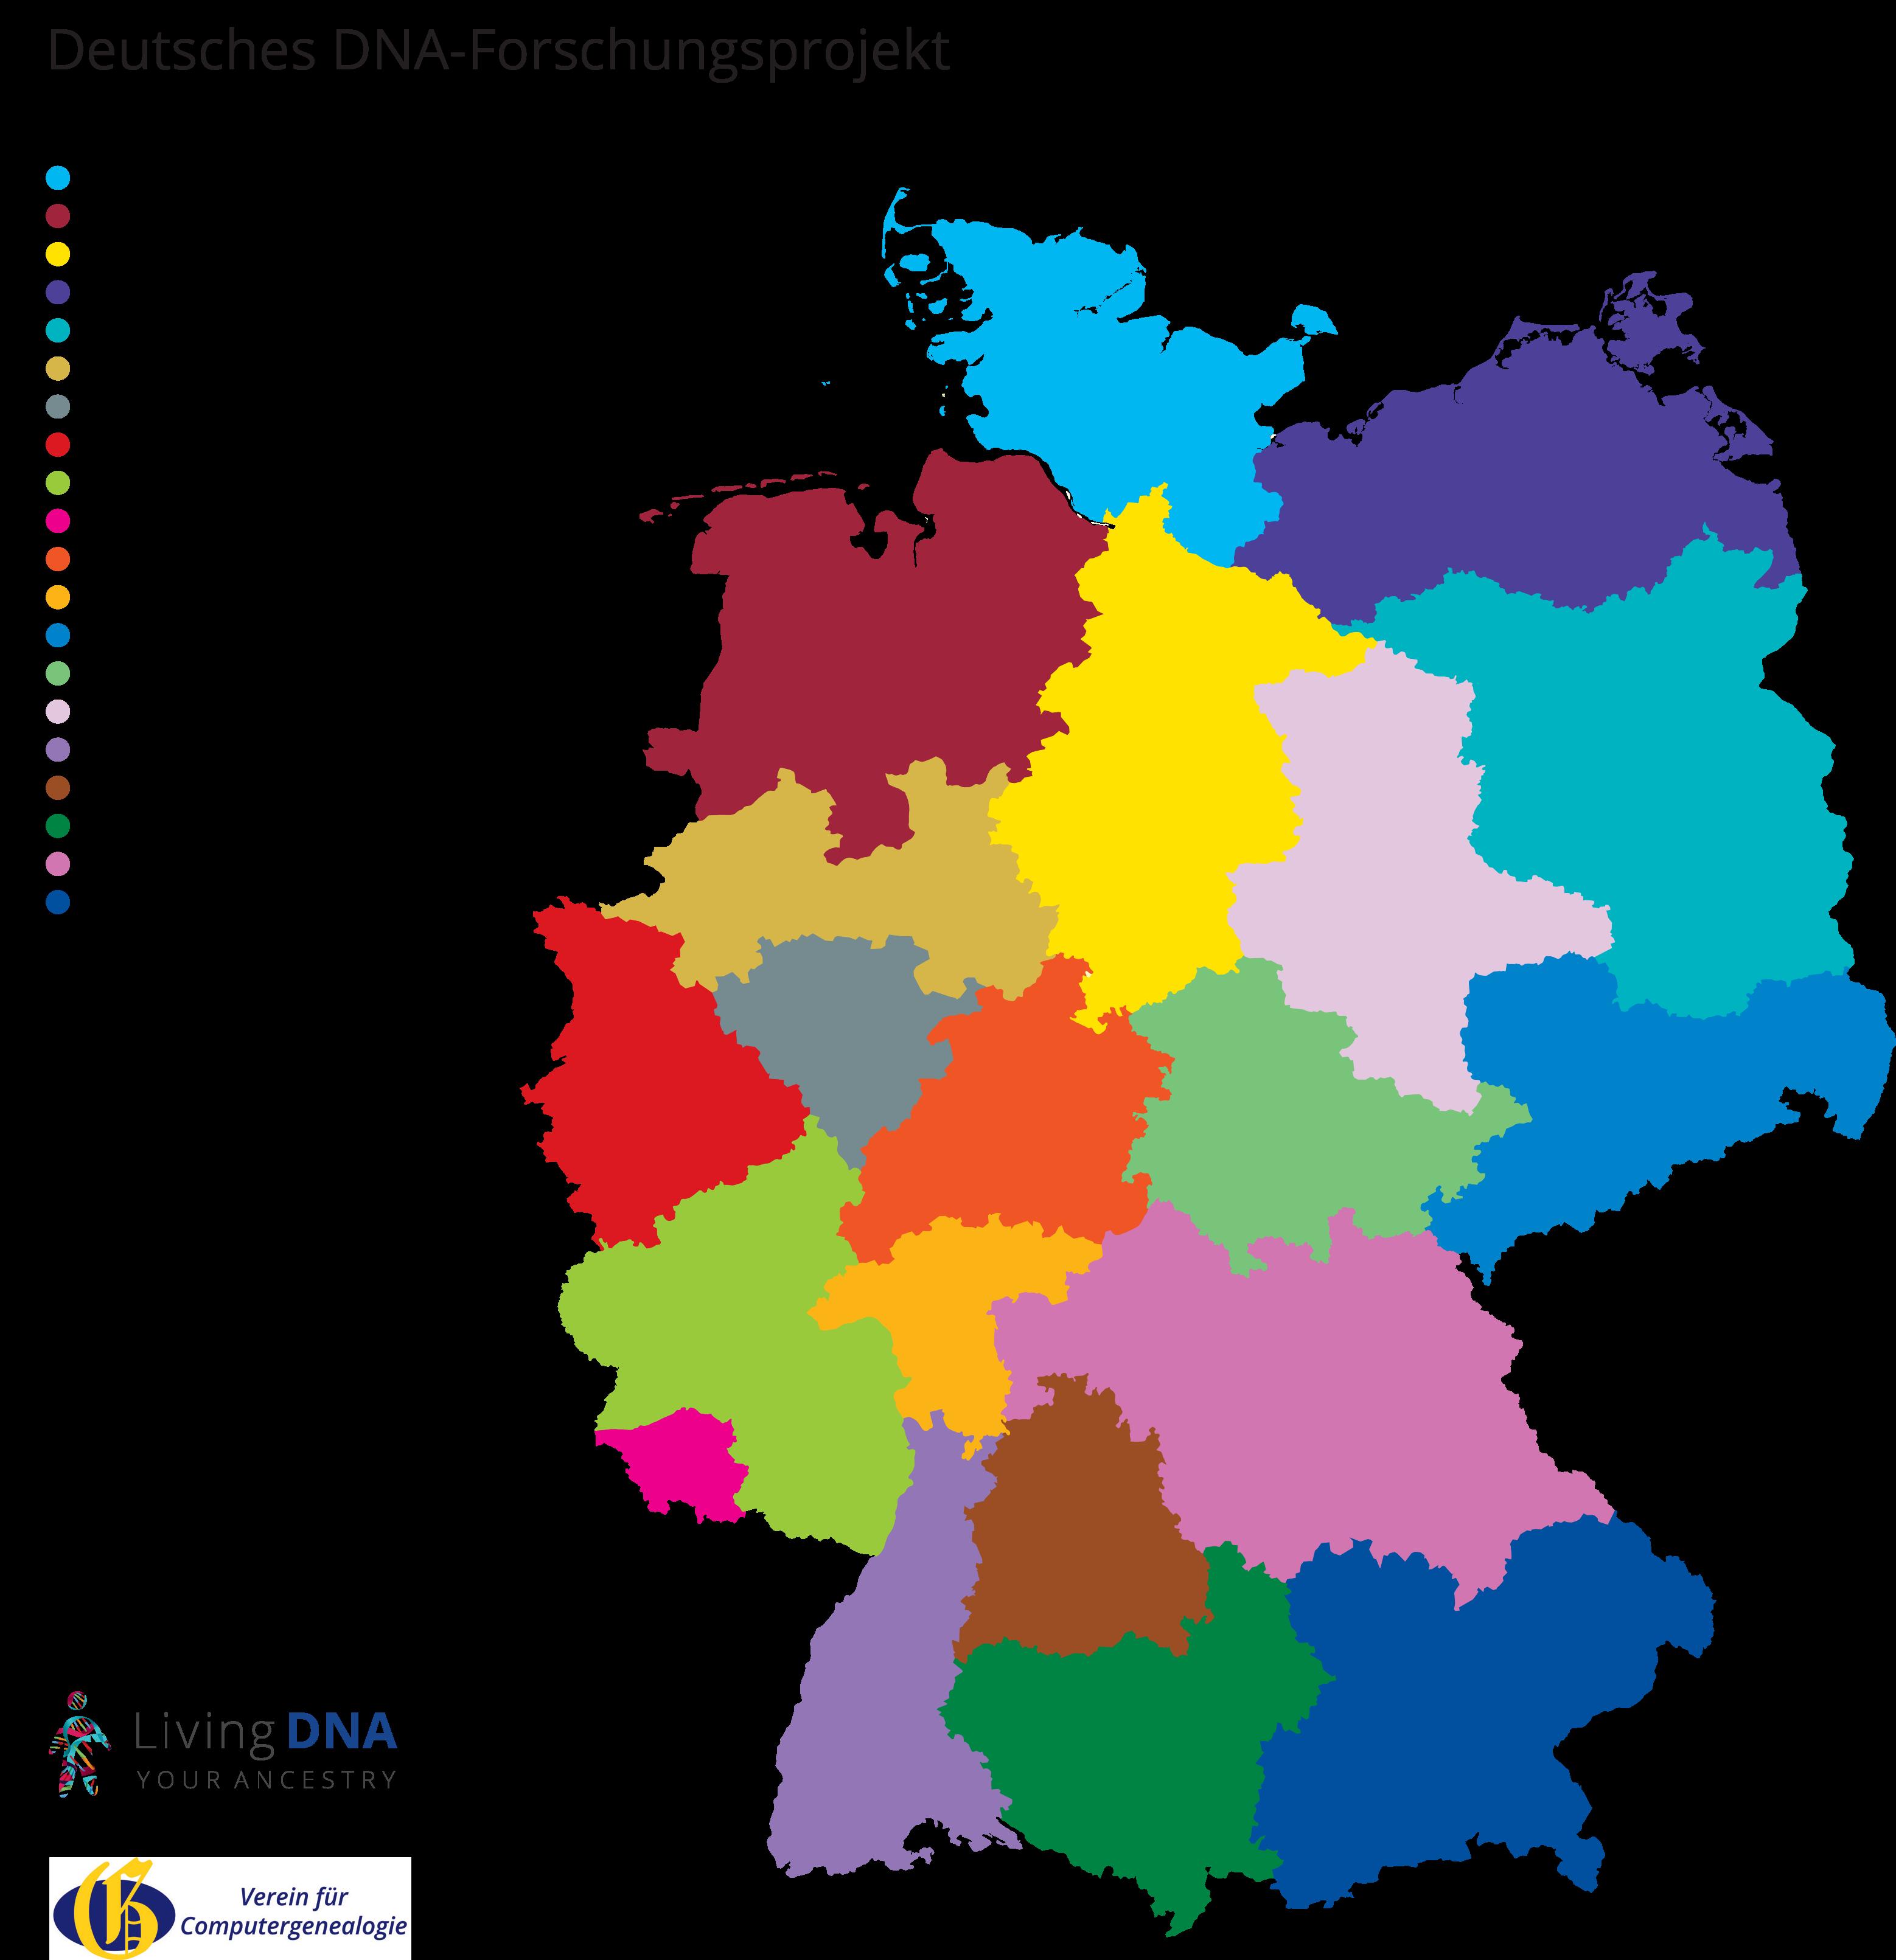 Deutsches DNA-Forschungsprojekt | Living DNA | Gen-Test | DNS-Test ...